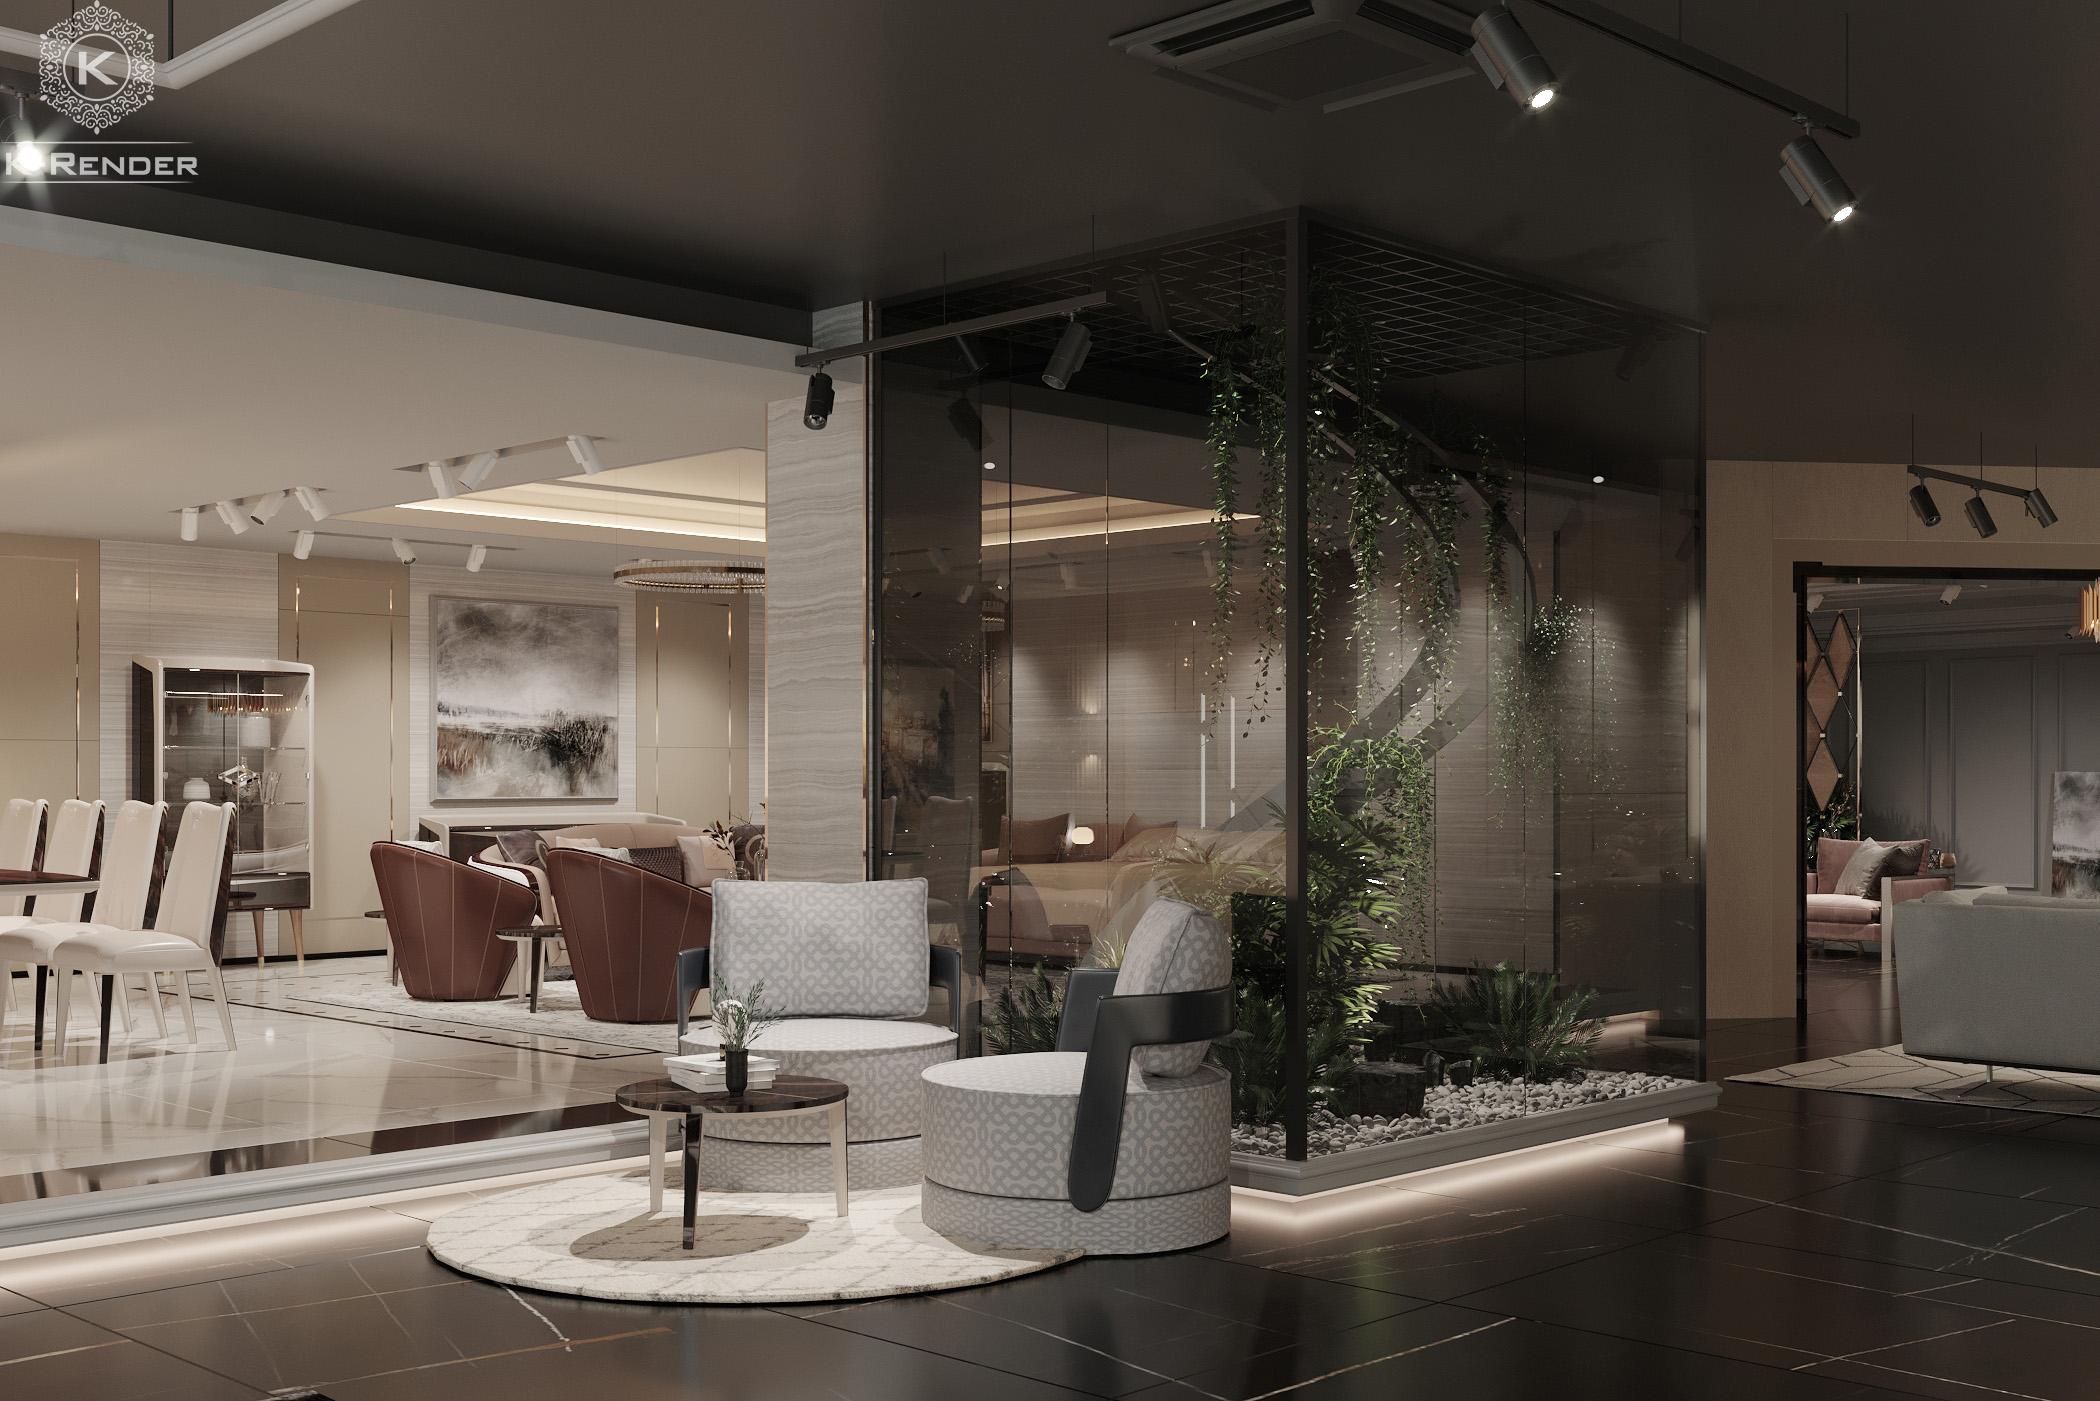 the-arture-home-project-k-render-studio-4